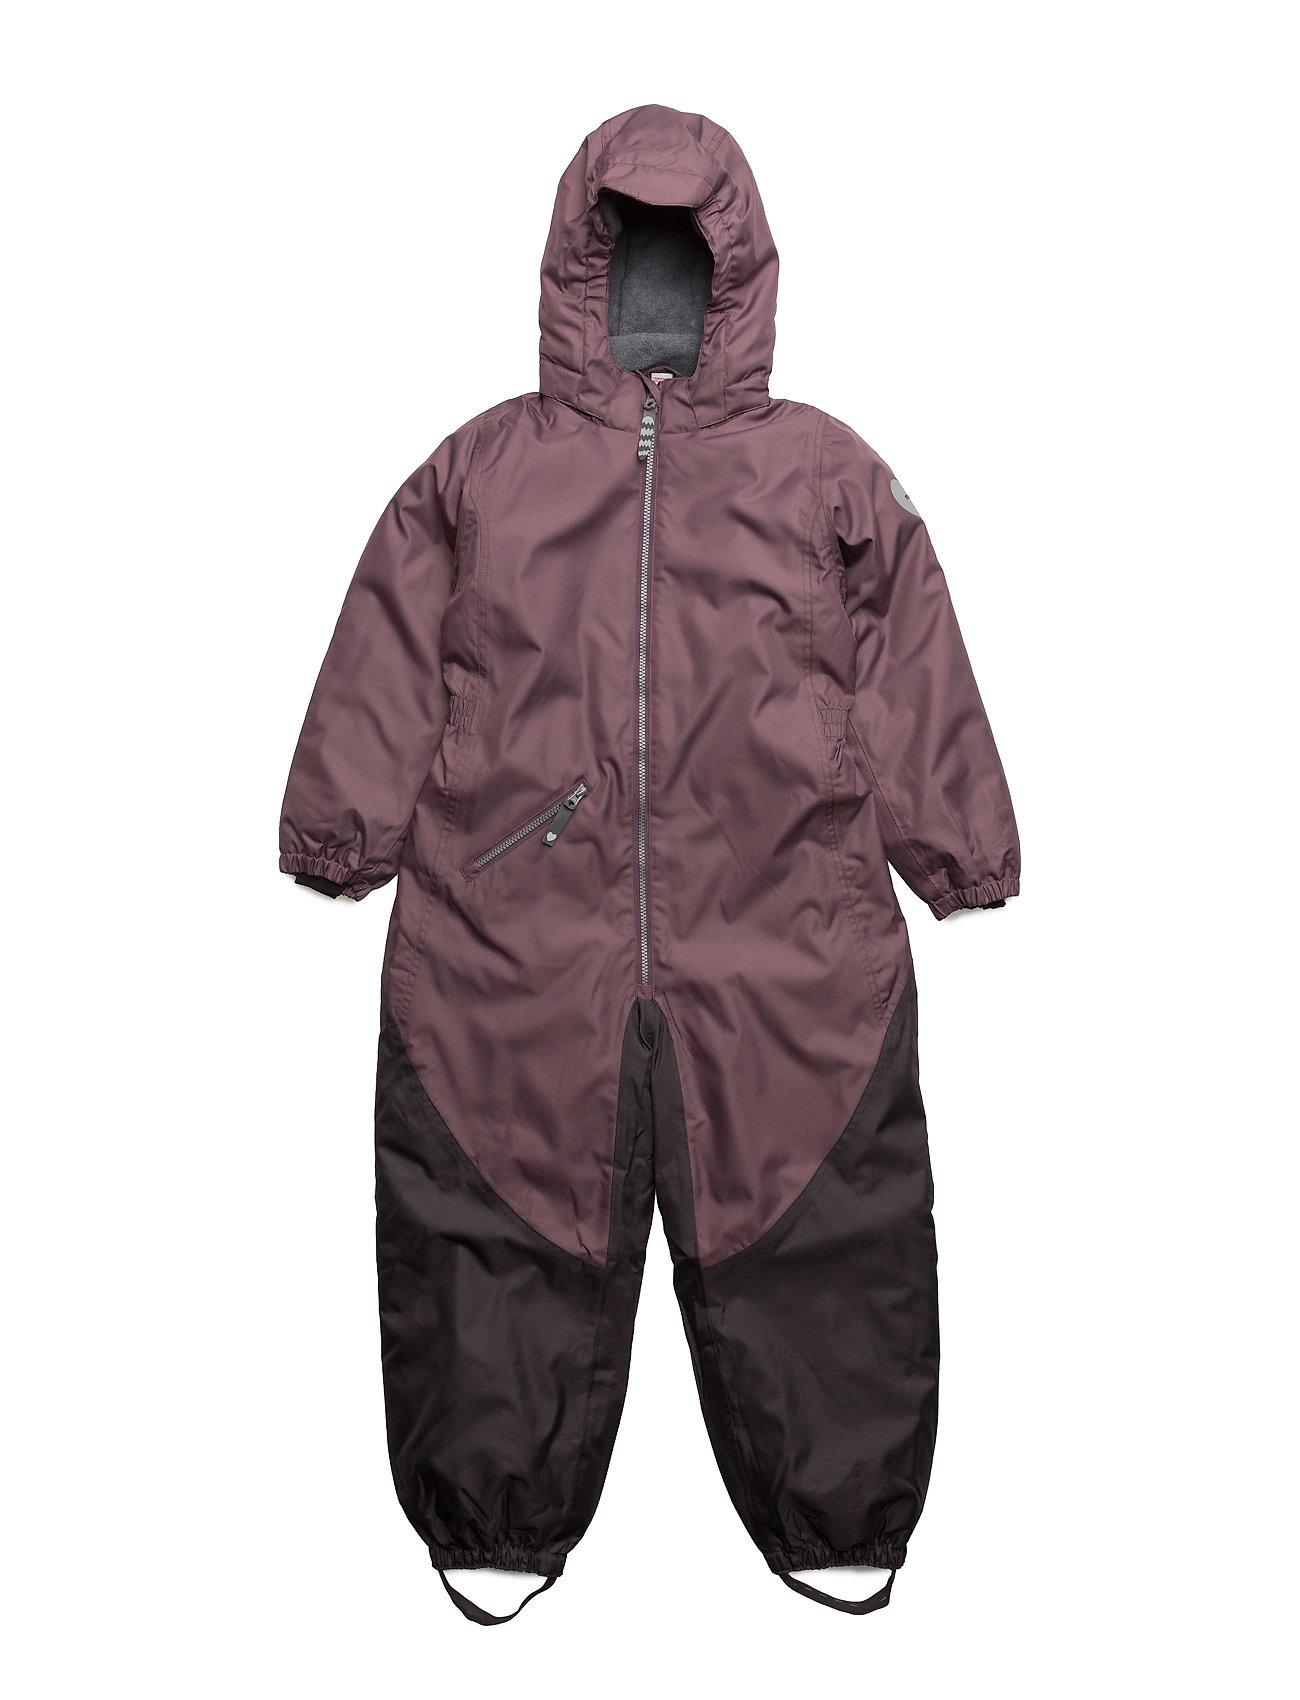 racoon outdoor – Caroline solid suit på boozt.com dk